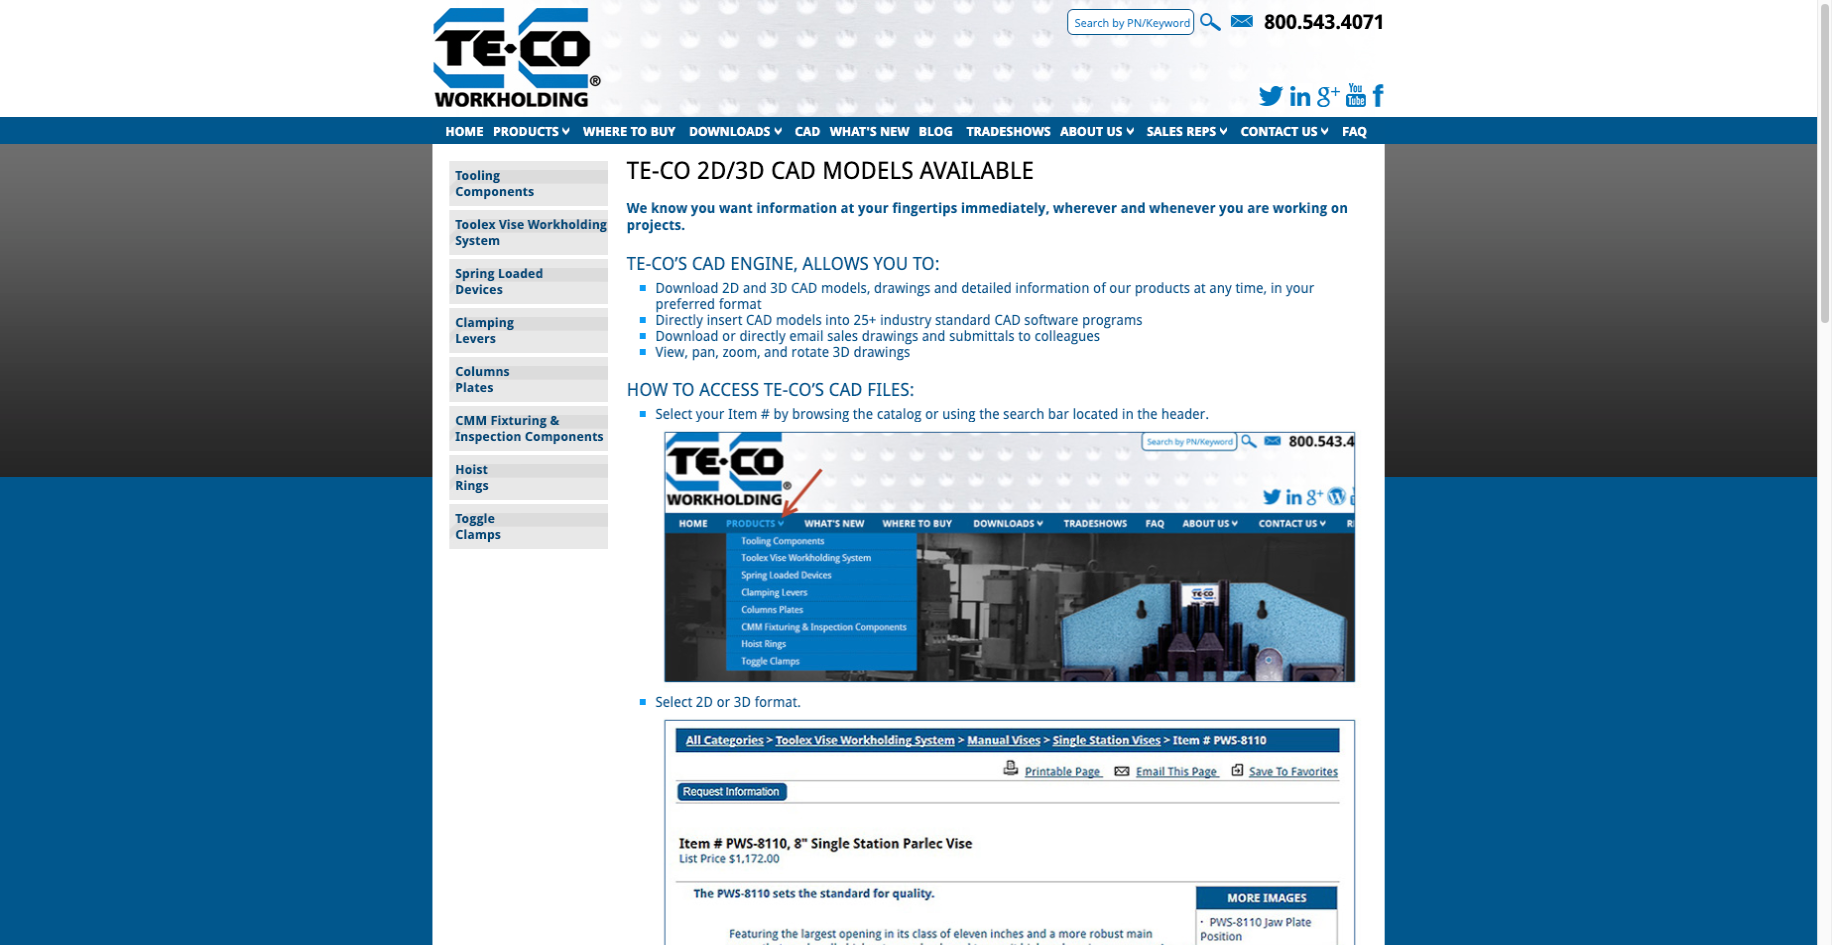 TECO Workholdings B2B eCommerce Website Example